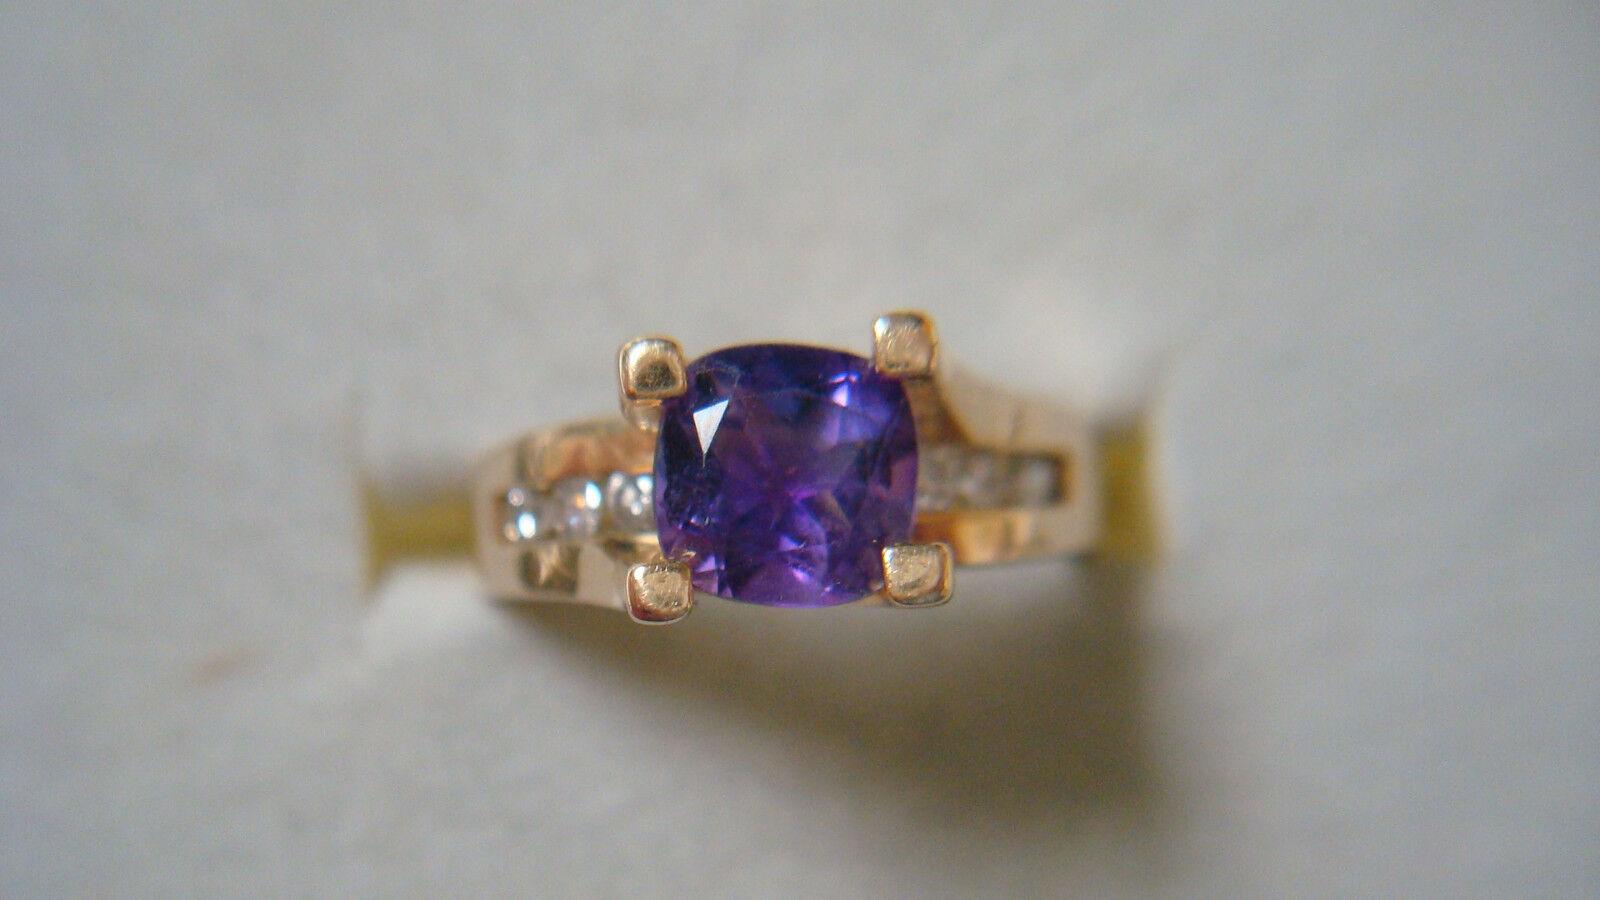 14K yg Amethyst & Diamond Ring - 4.4 Grams - Sz. 7 - 1.0ctw. Approx ( Dw69)